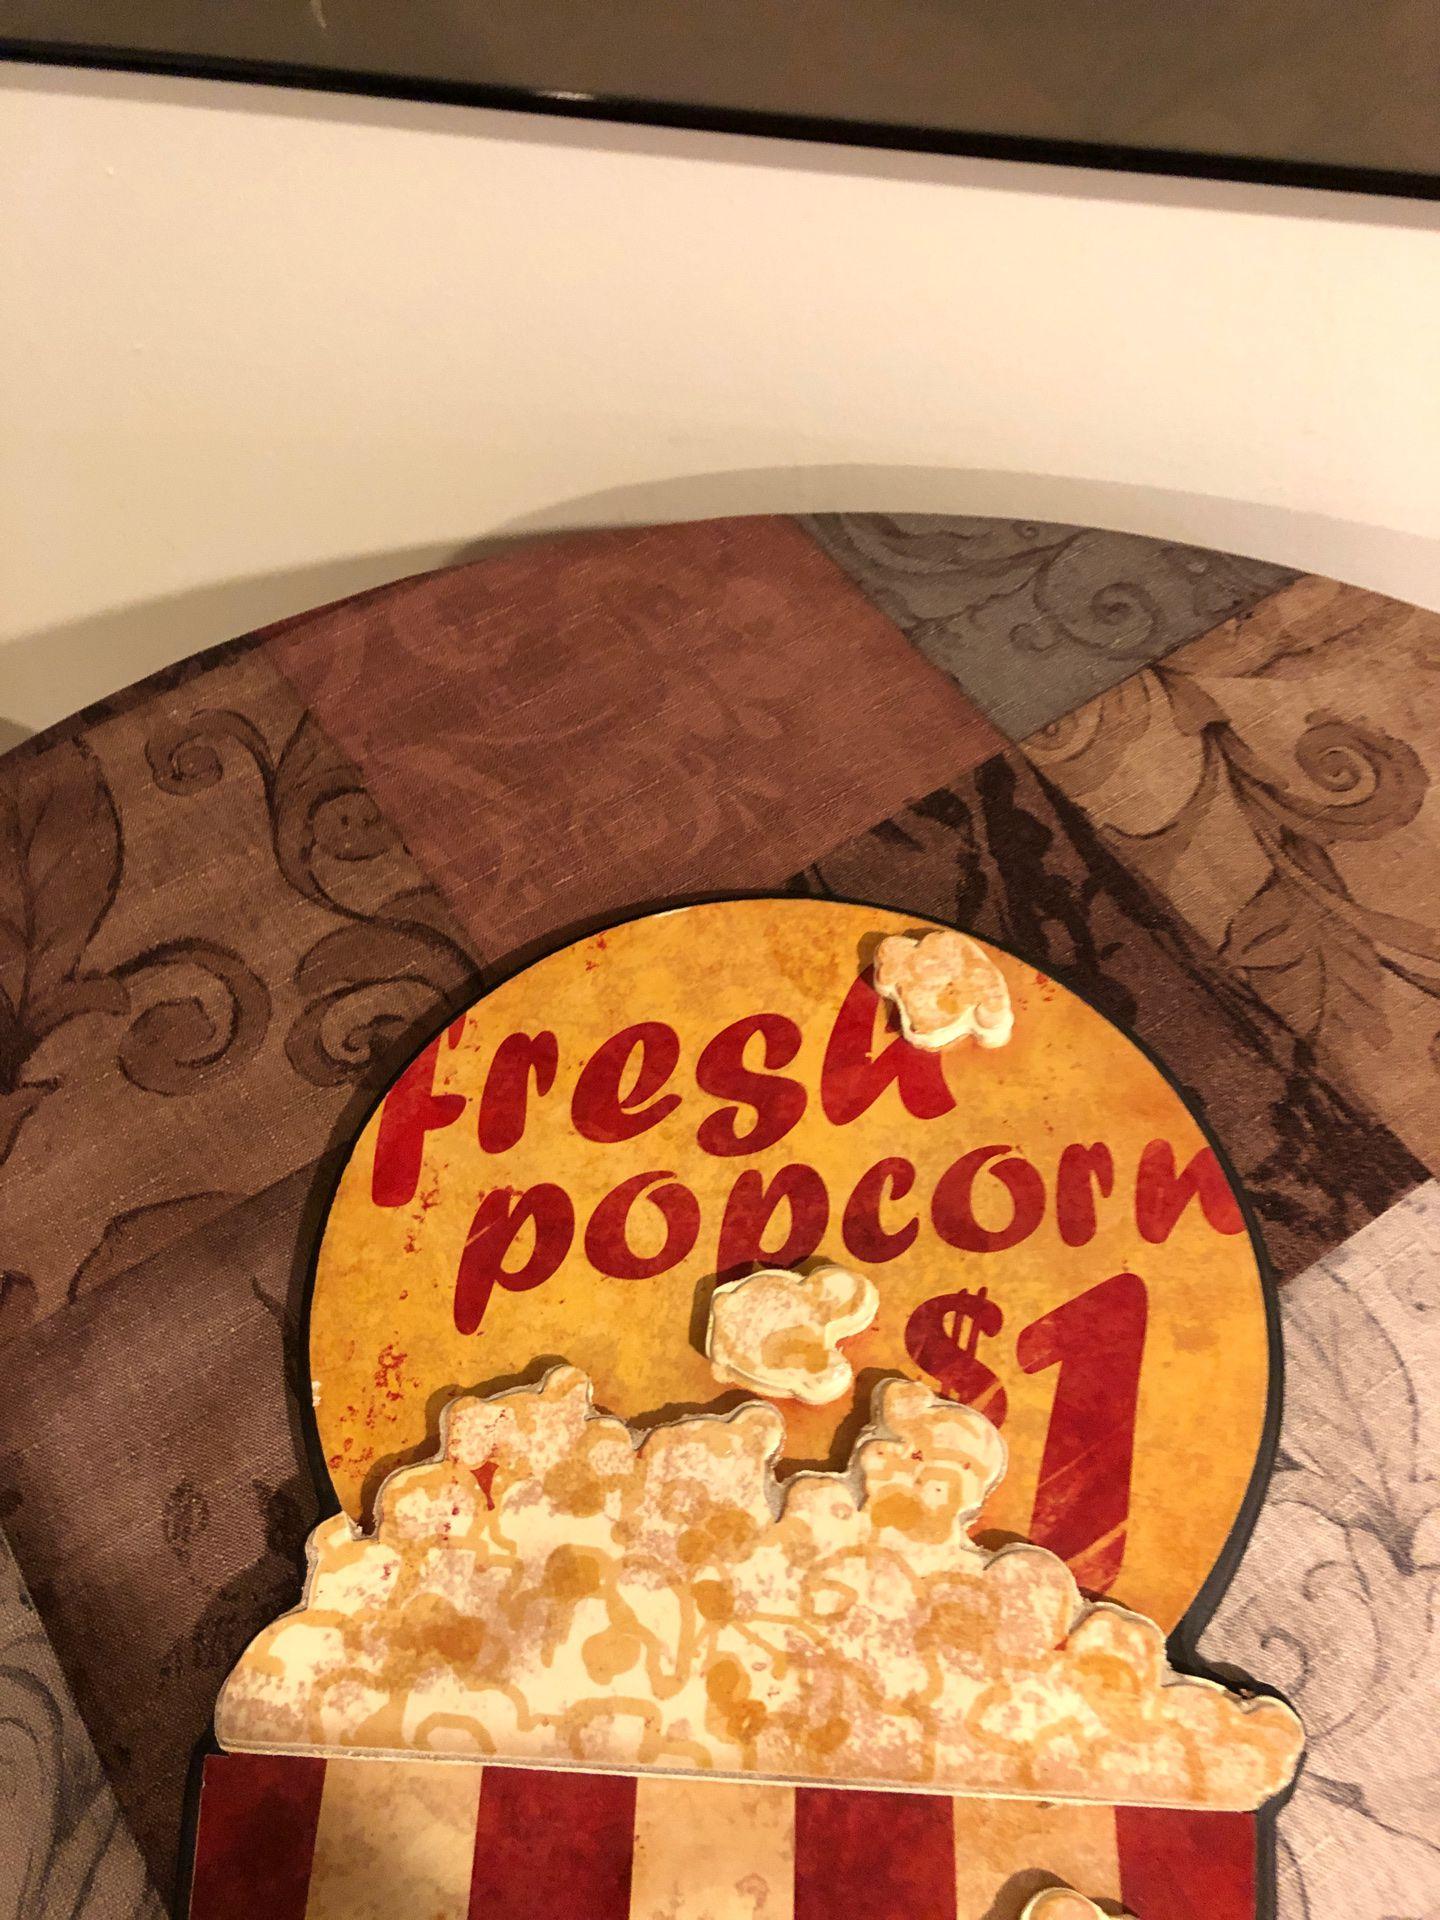 Pop corn sign